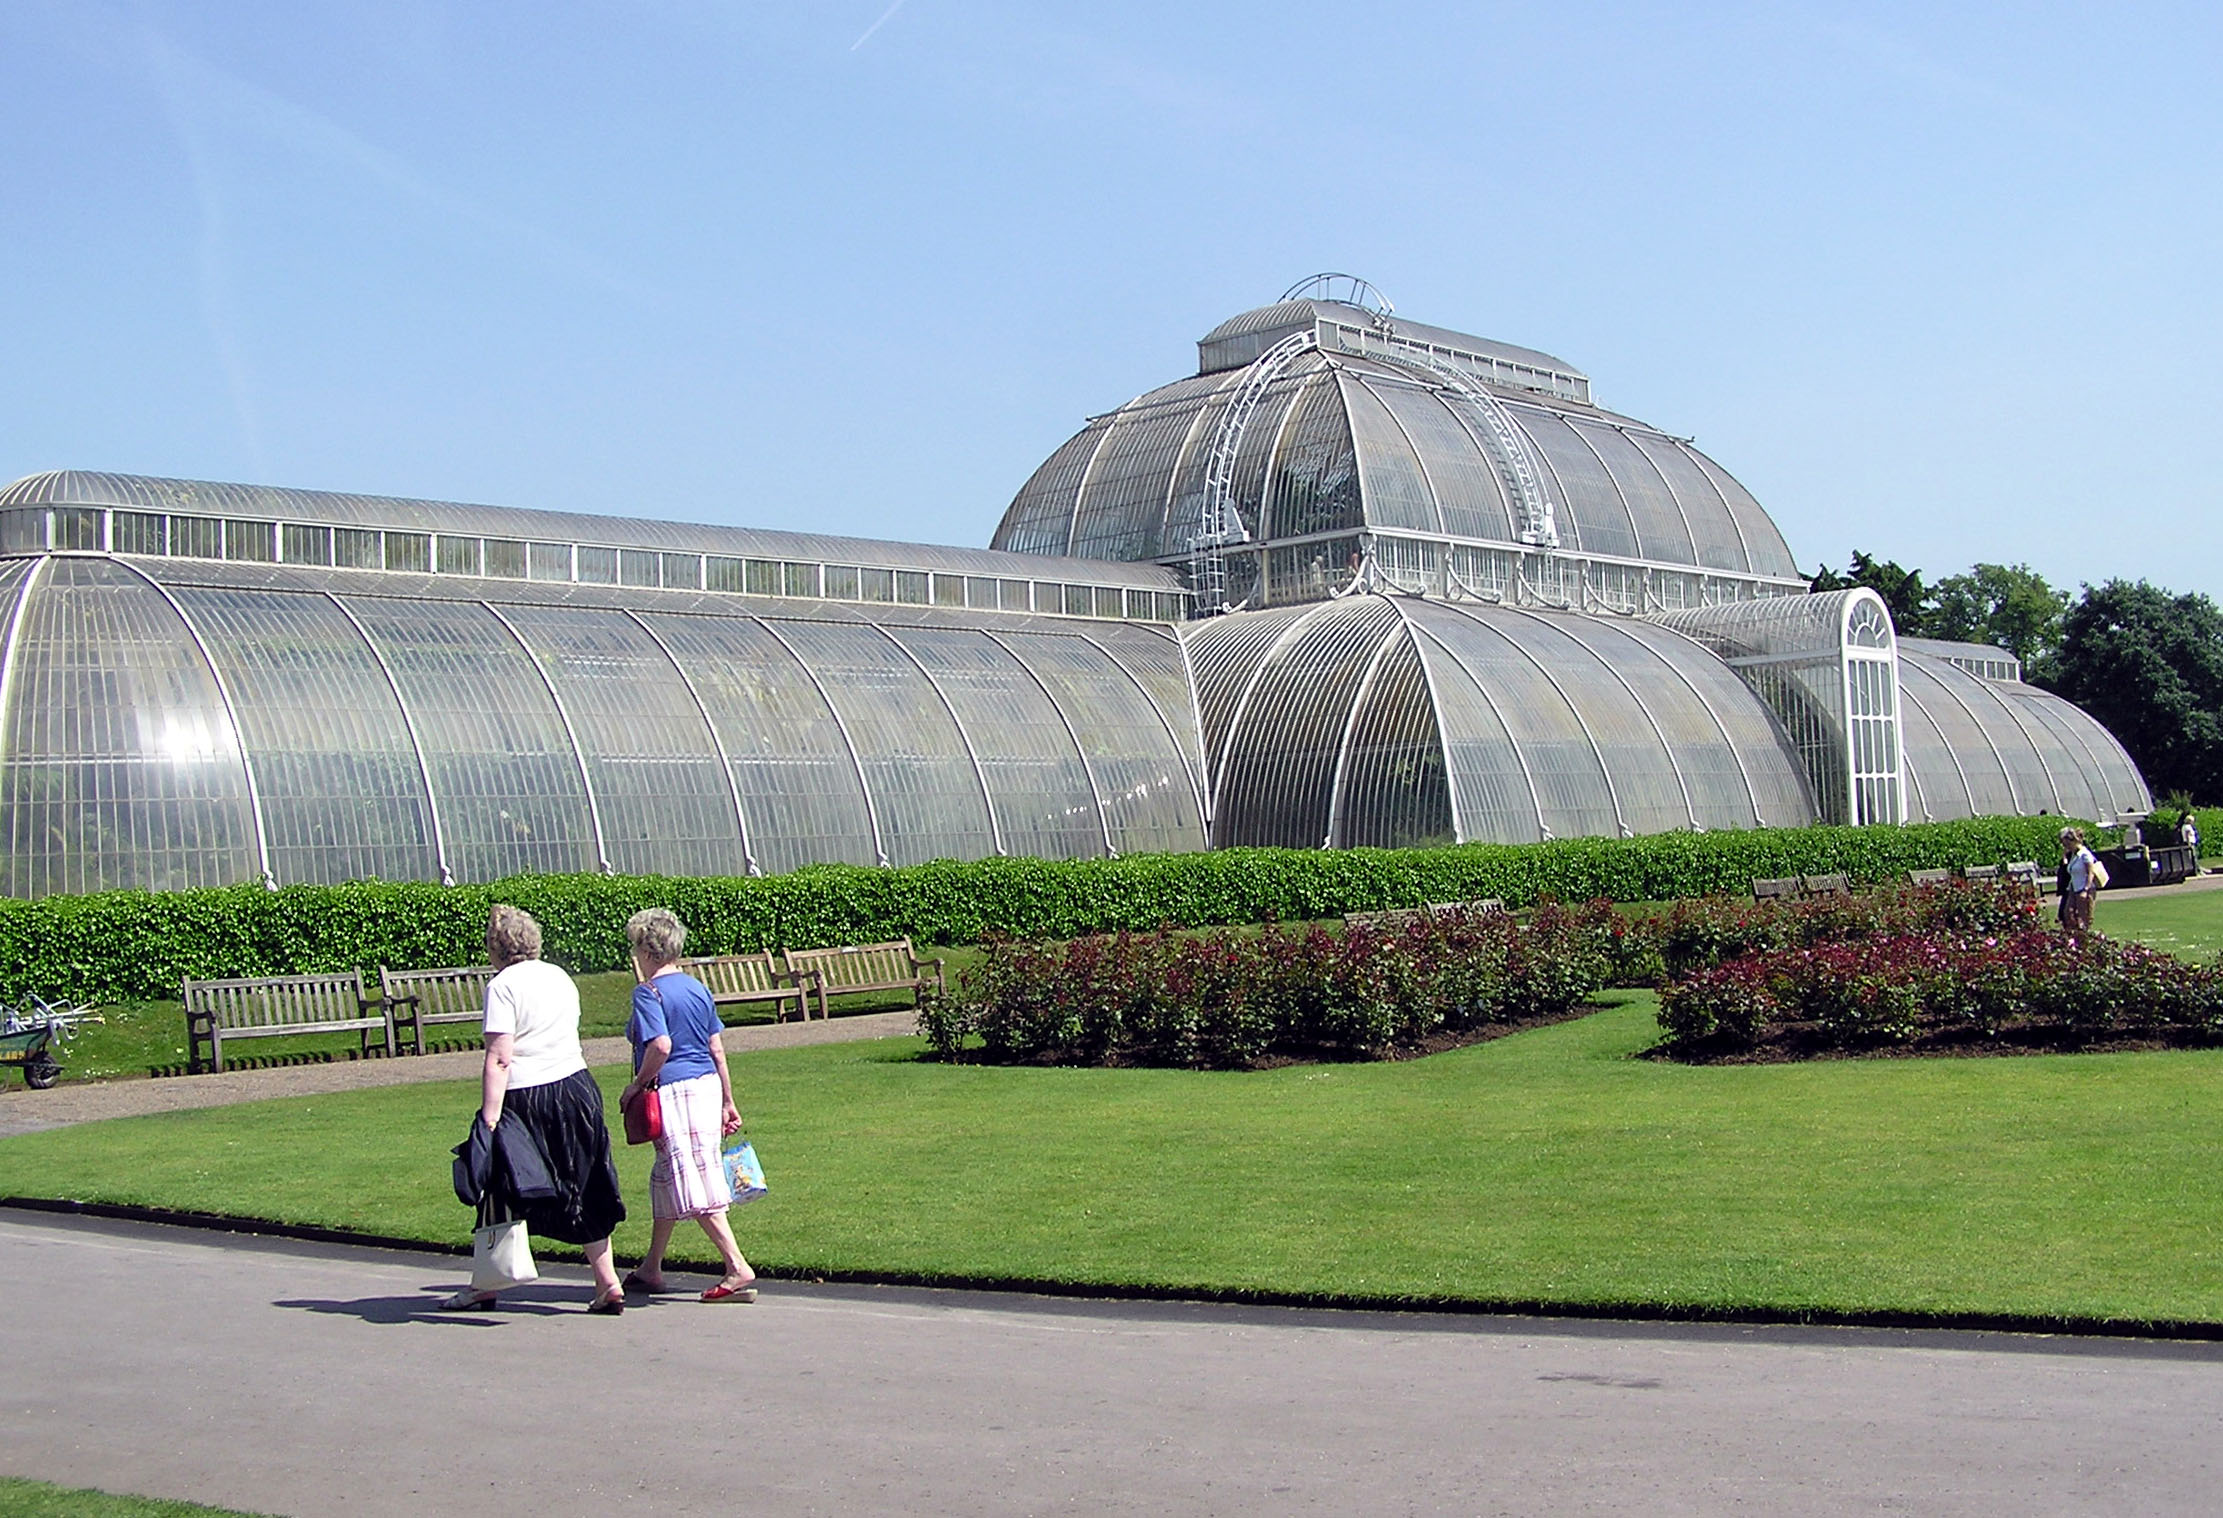 Datei:Kew.gardens.palm.house.london.arp.jpg – Wikipedia